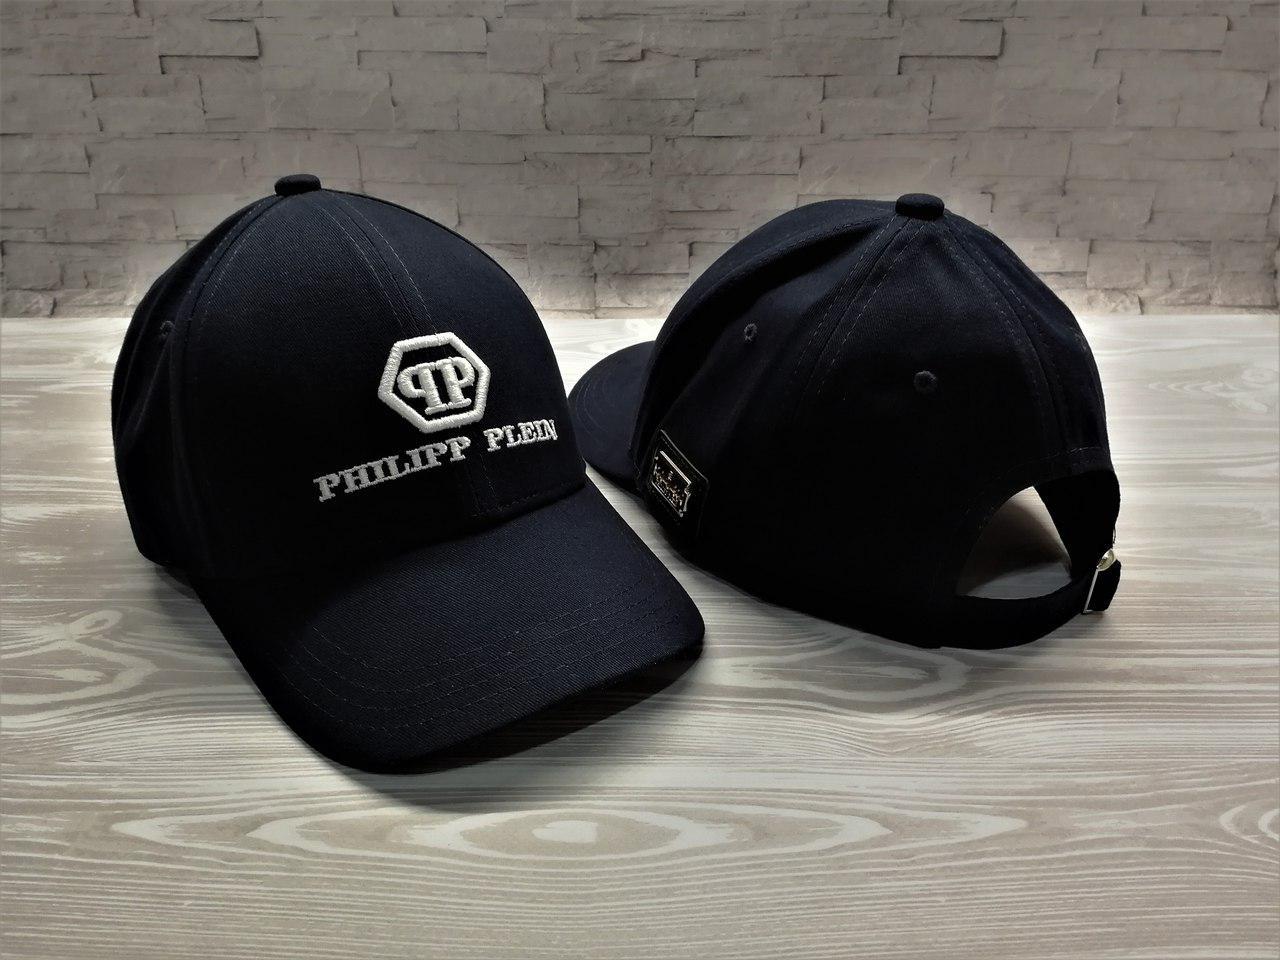 Мужская кепка Филип Плейн Phlipp Plein пятиклинка тёмно-синяя (реплика)